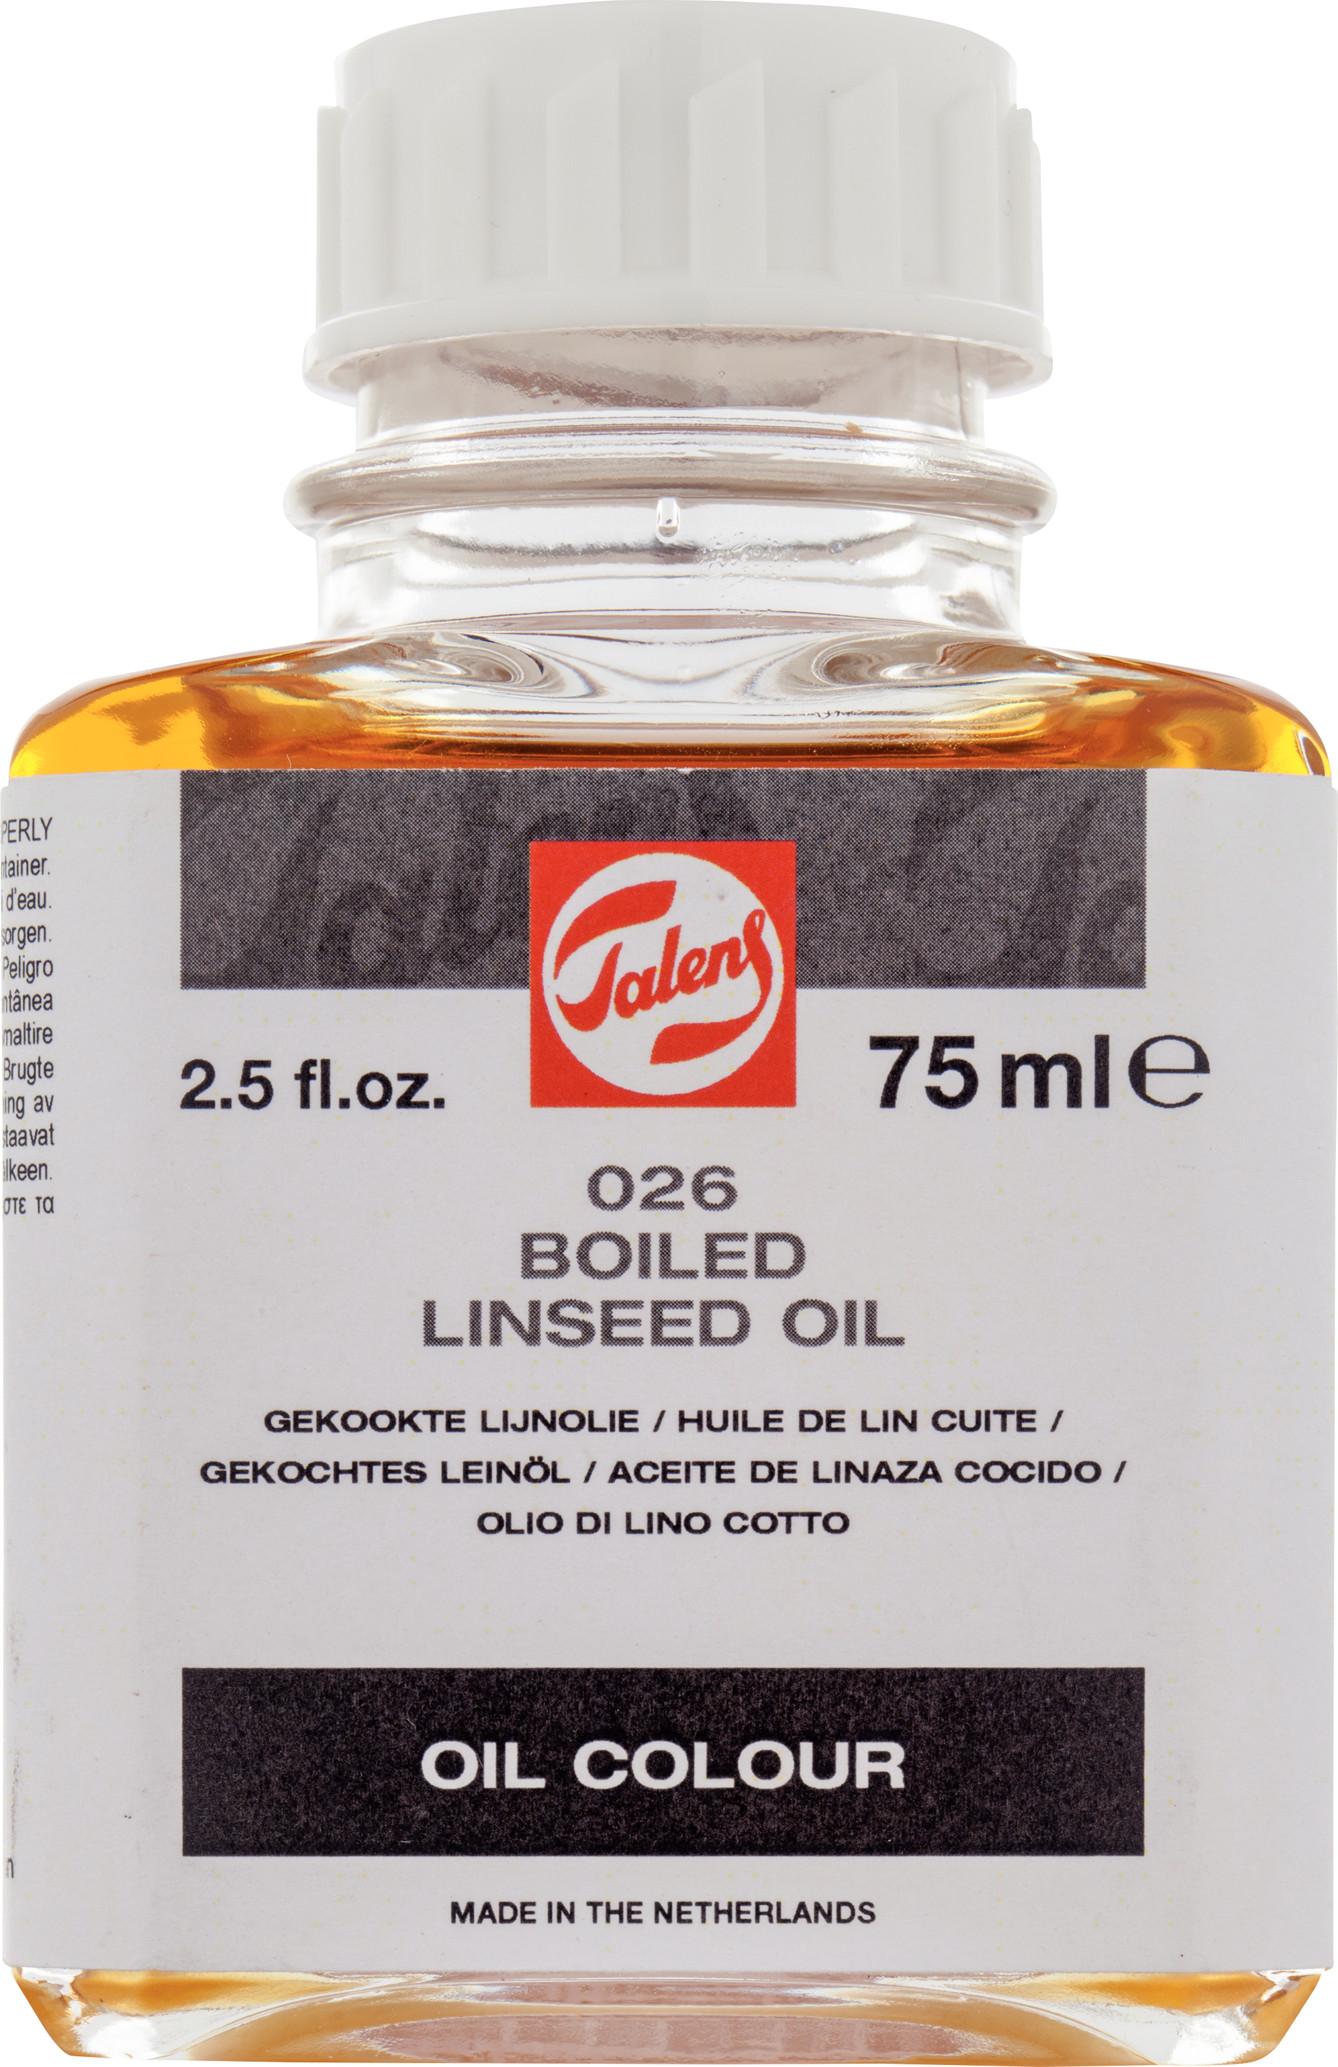 Boiled Linseed Oil Bottle 75 ml